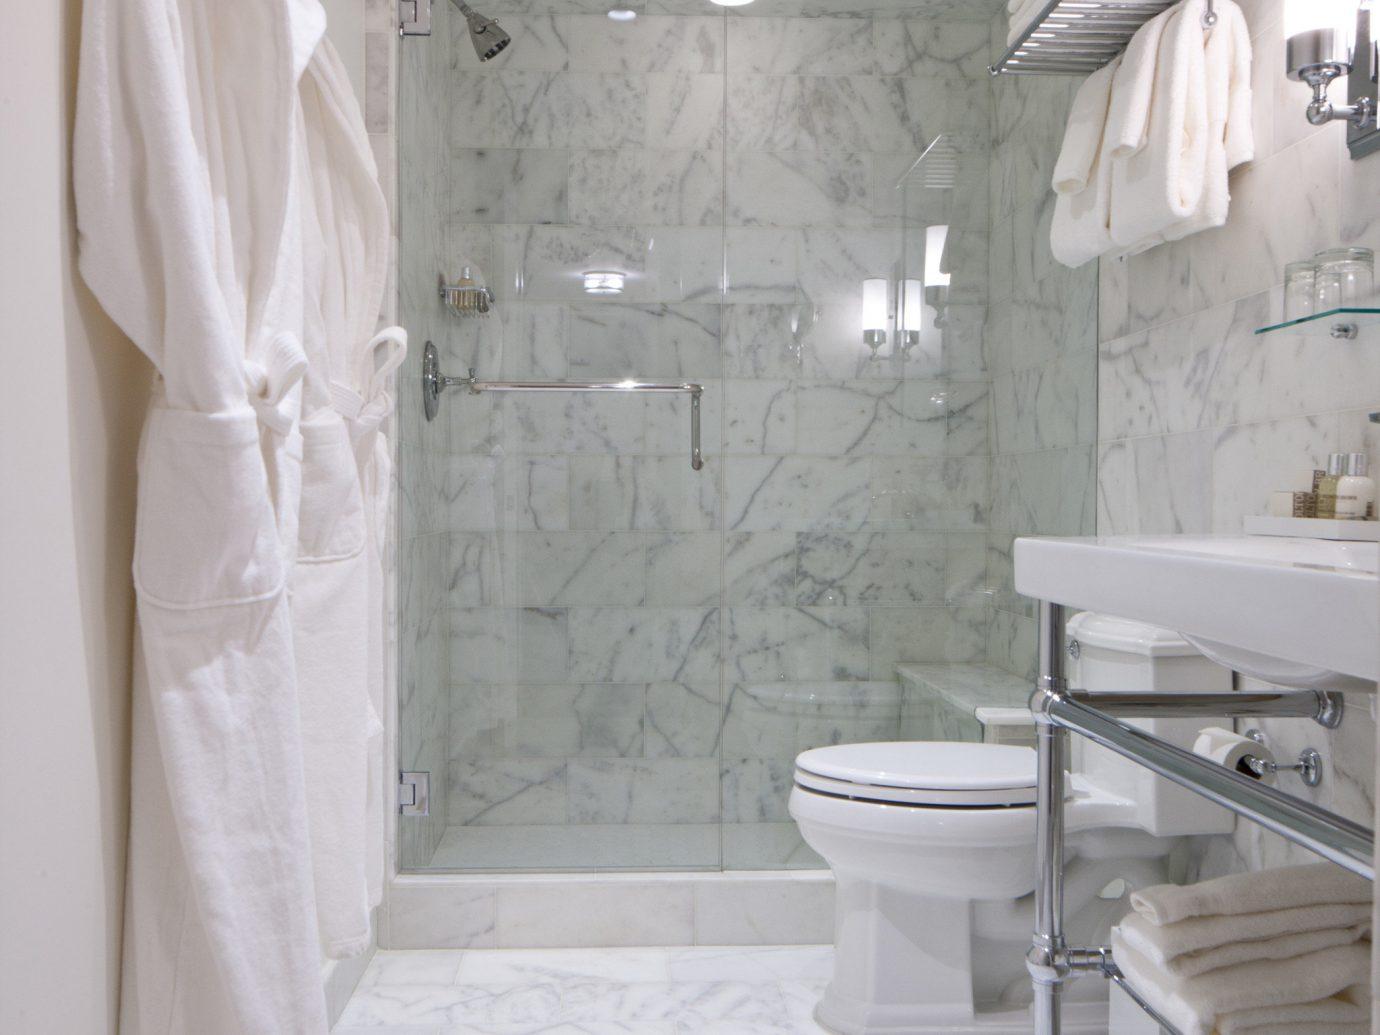 Trip Ideas Weekend Getaways Winter bathroom indoor wall room tile floor interior design flooring plumbing fixture home shower tap ceiling tub marble daylighting ceramic toilet bathtub Bath tiled